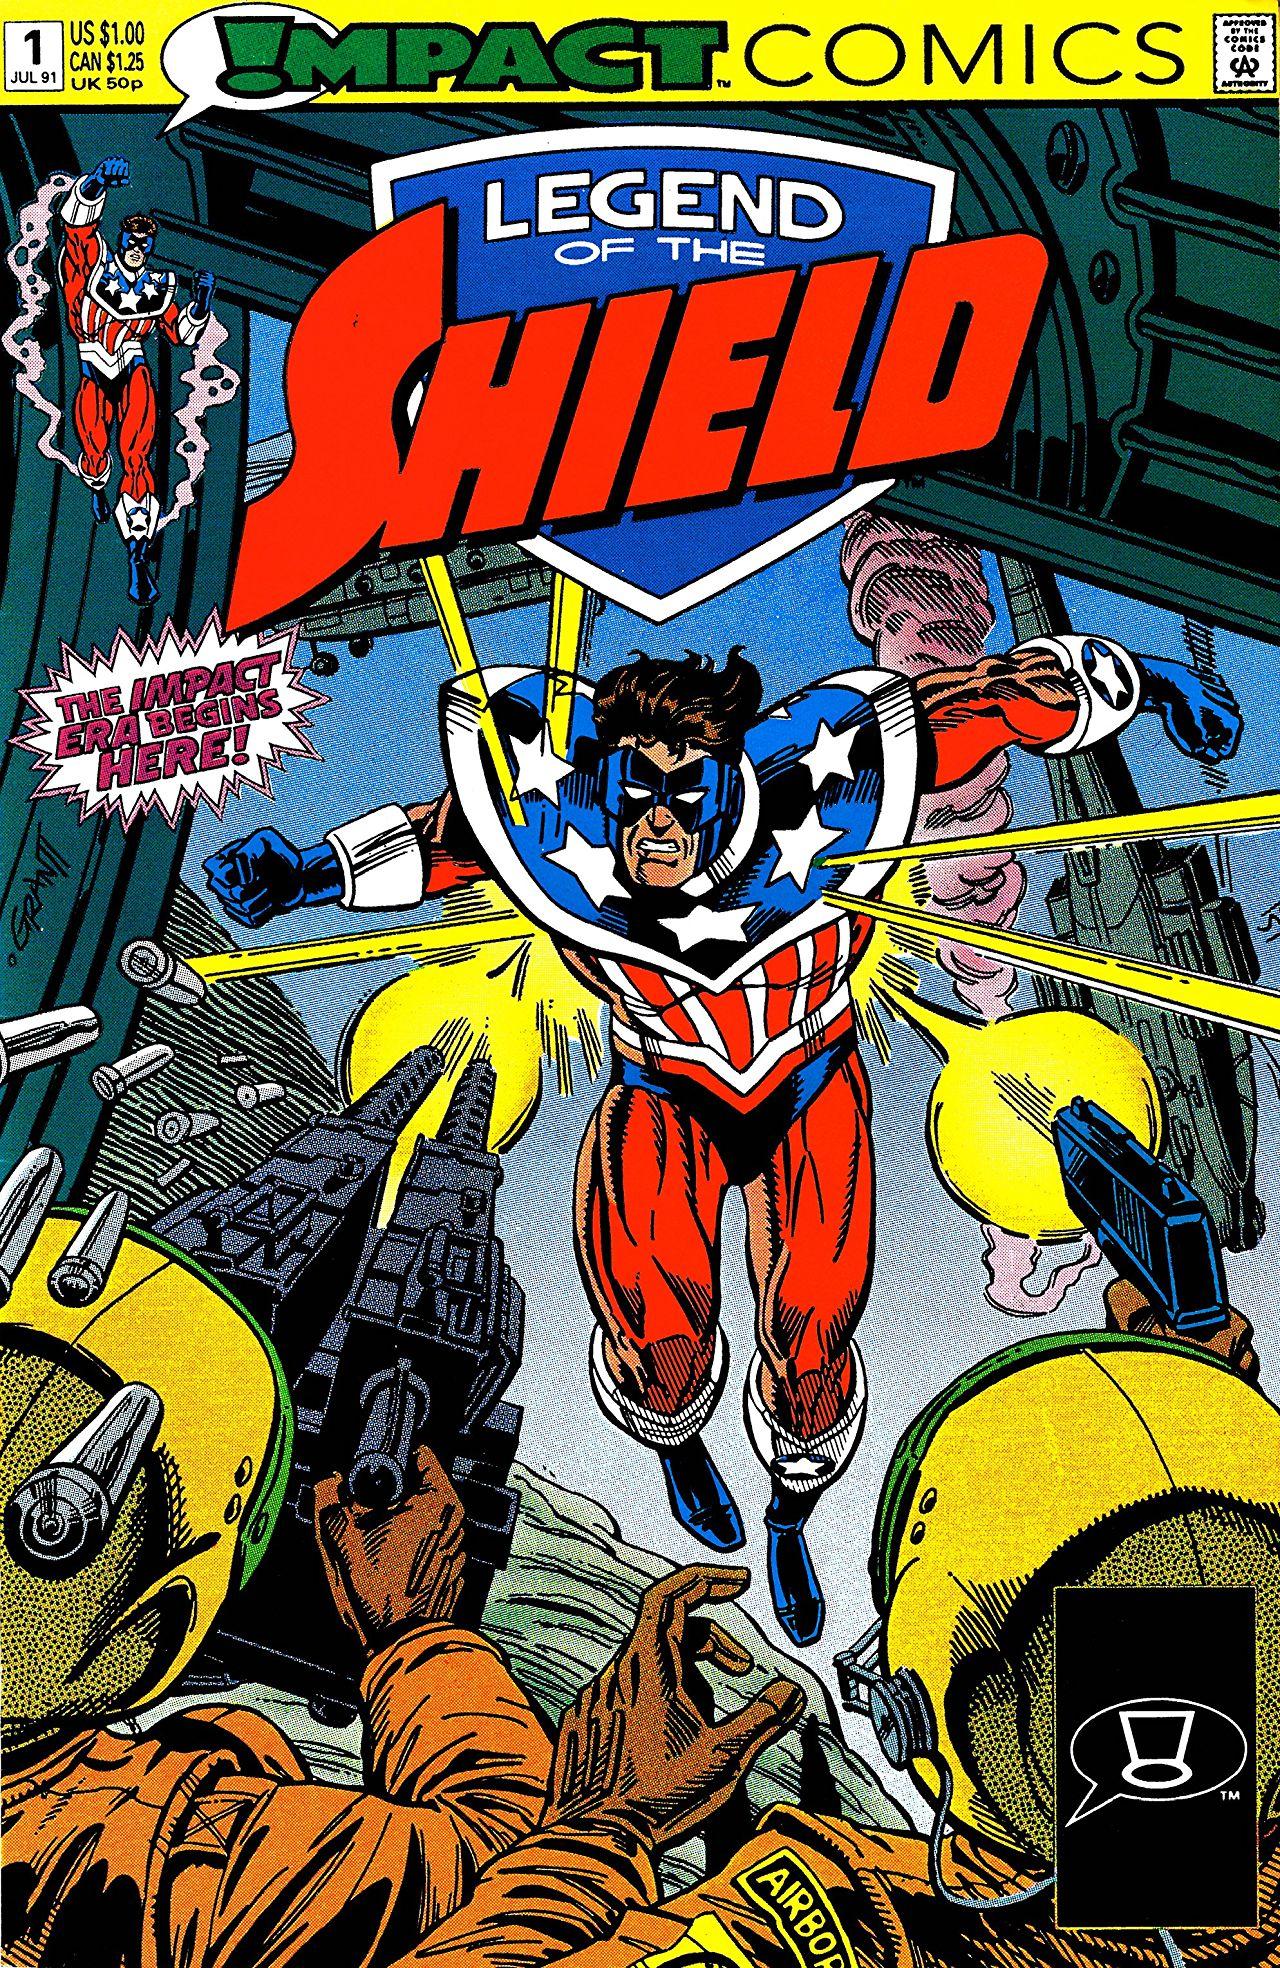 Archie comics archie comics sneak peek of the week major spoilers - Legend Of The Shield 1